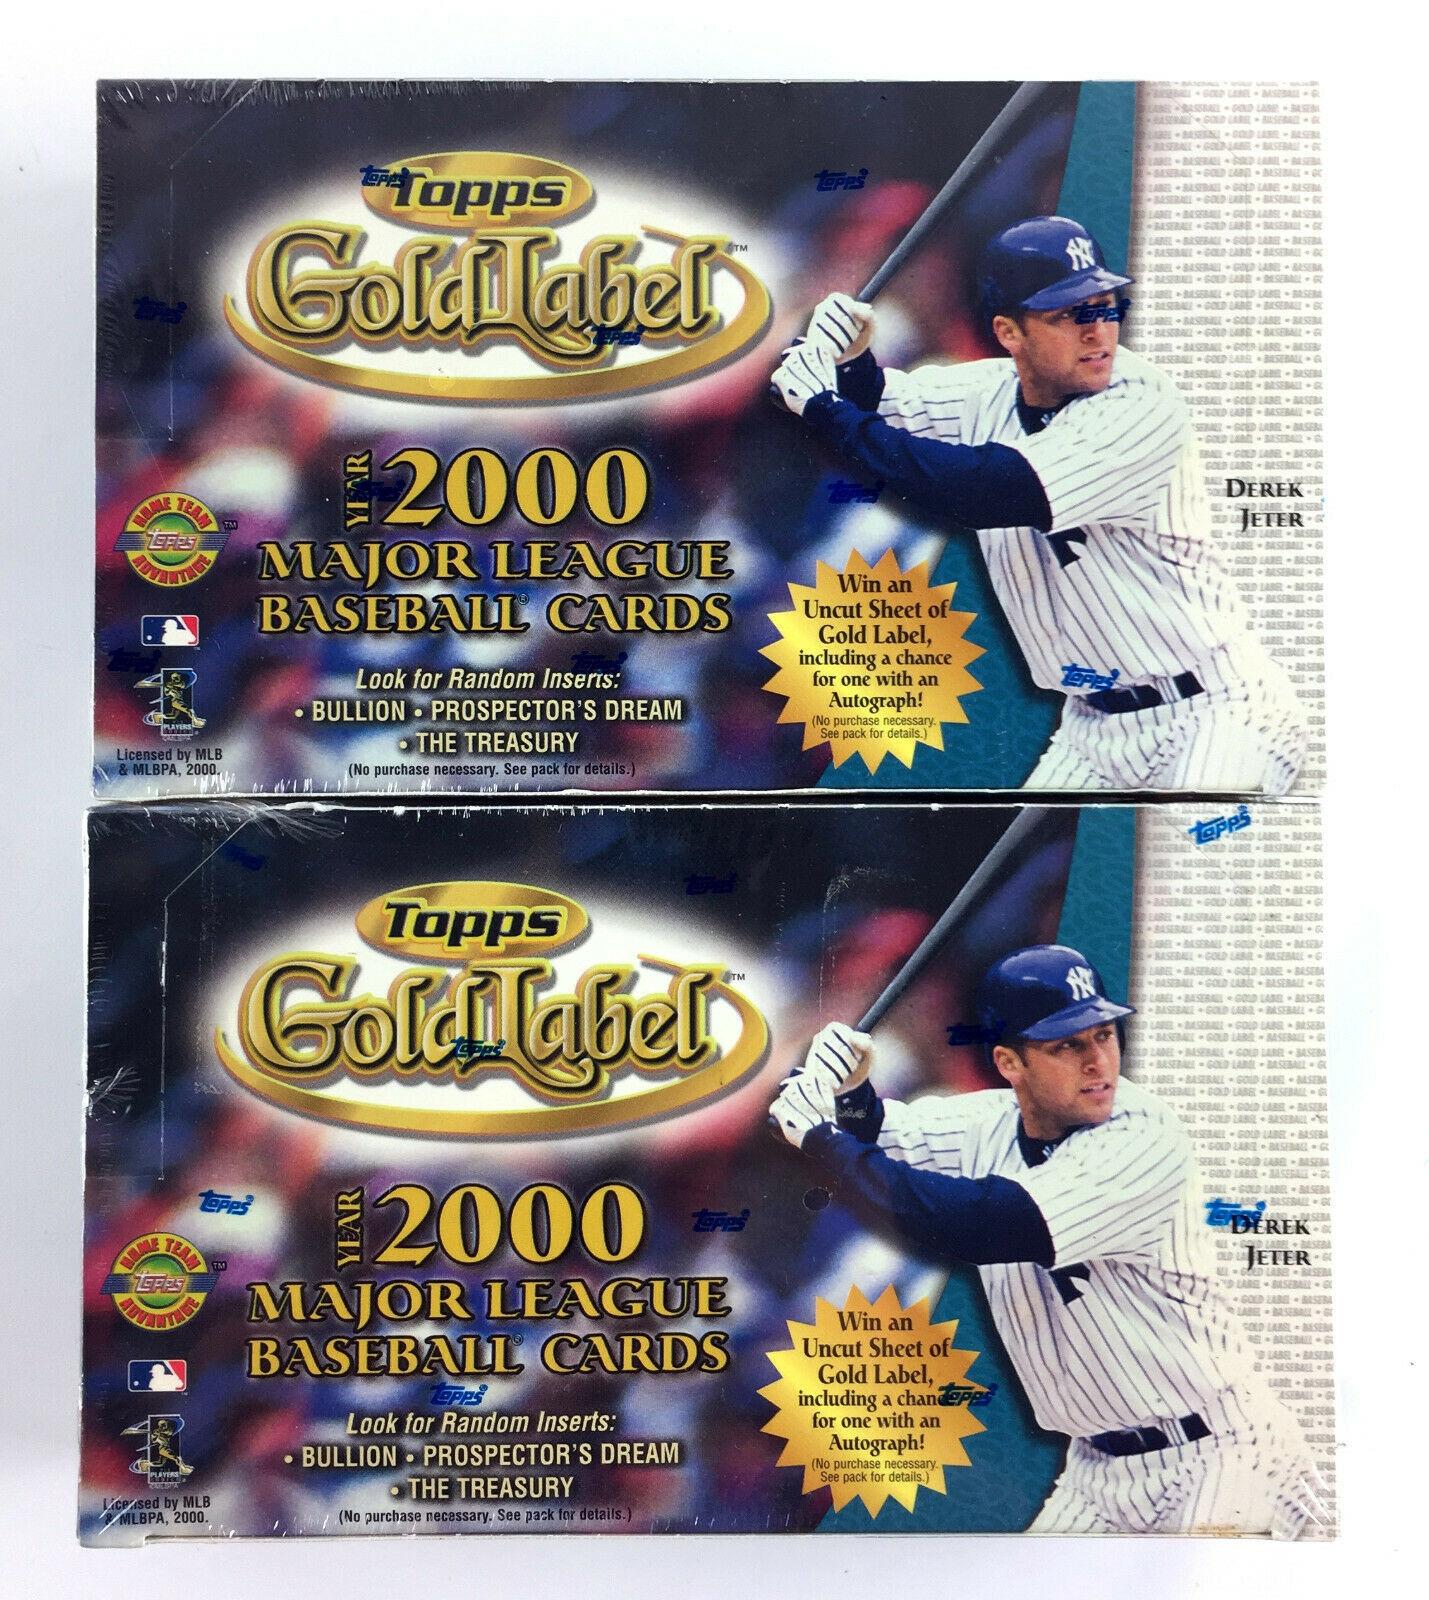 (2) 2000 Topps Gold Label Baseball Box - 24 Packs - 5 Super Premium Cards Per